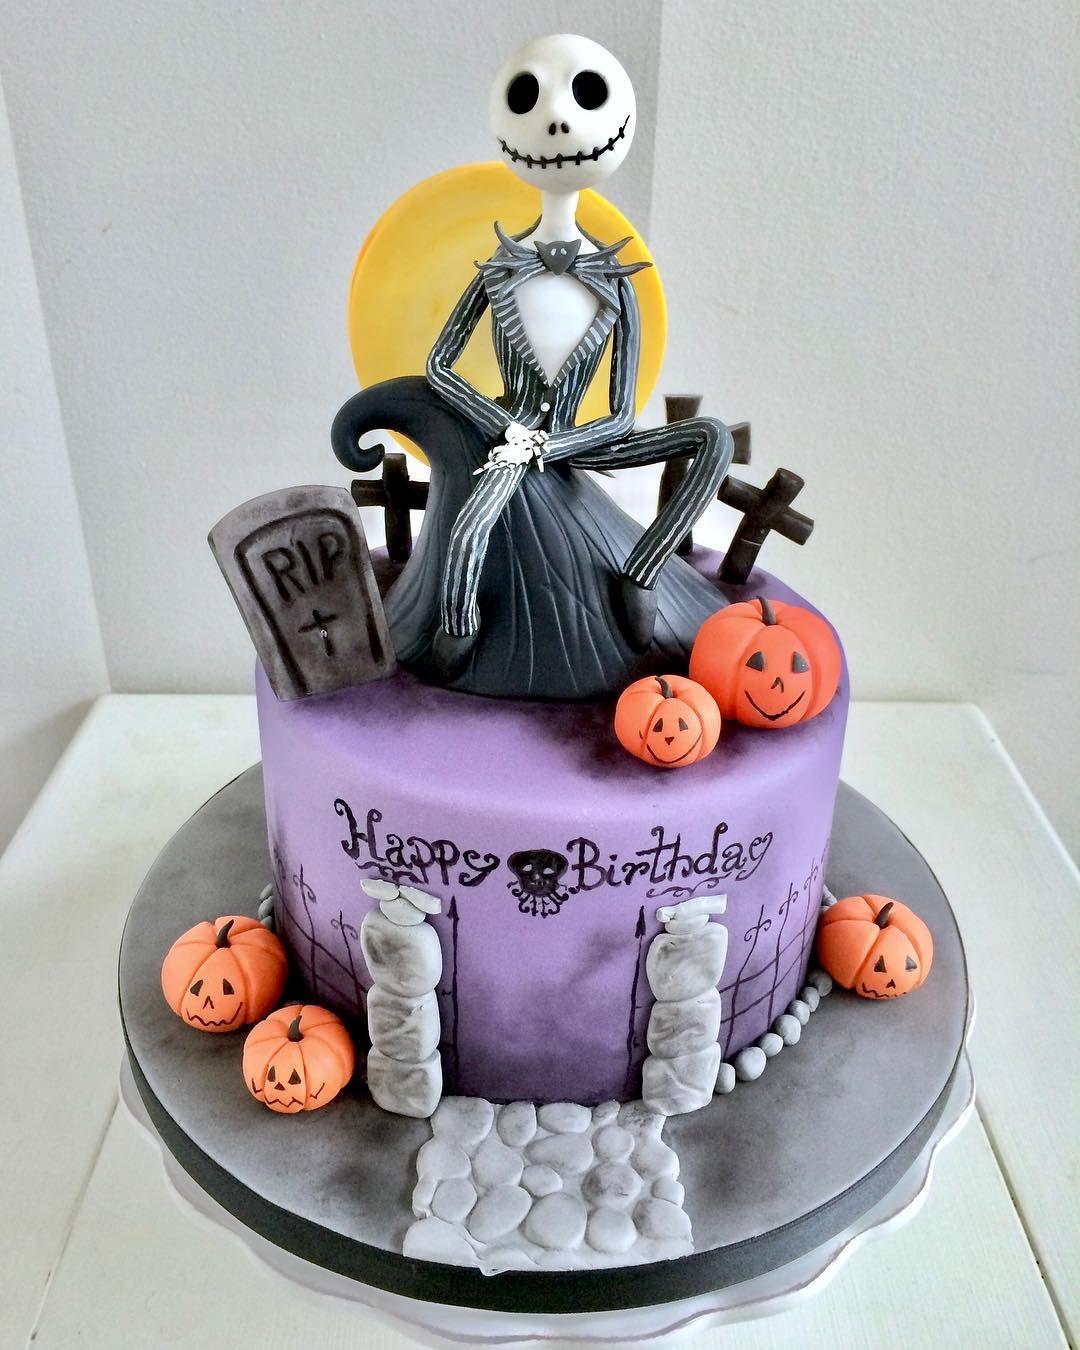 Pin By Gemma Massen On Cupcakes Cake Christmas Birthday Cake